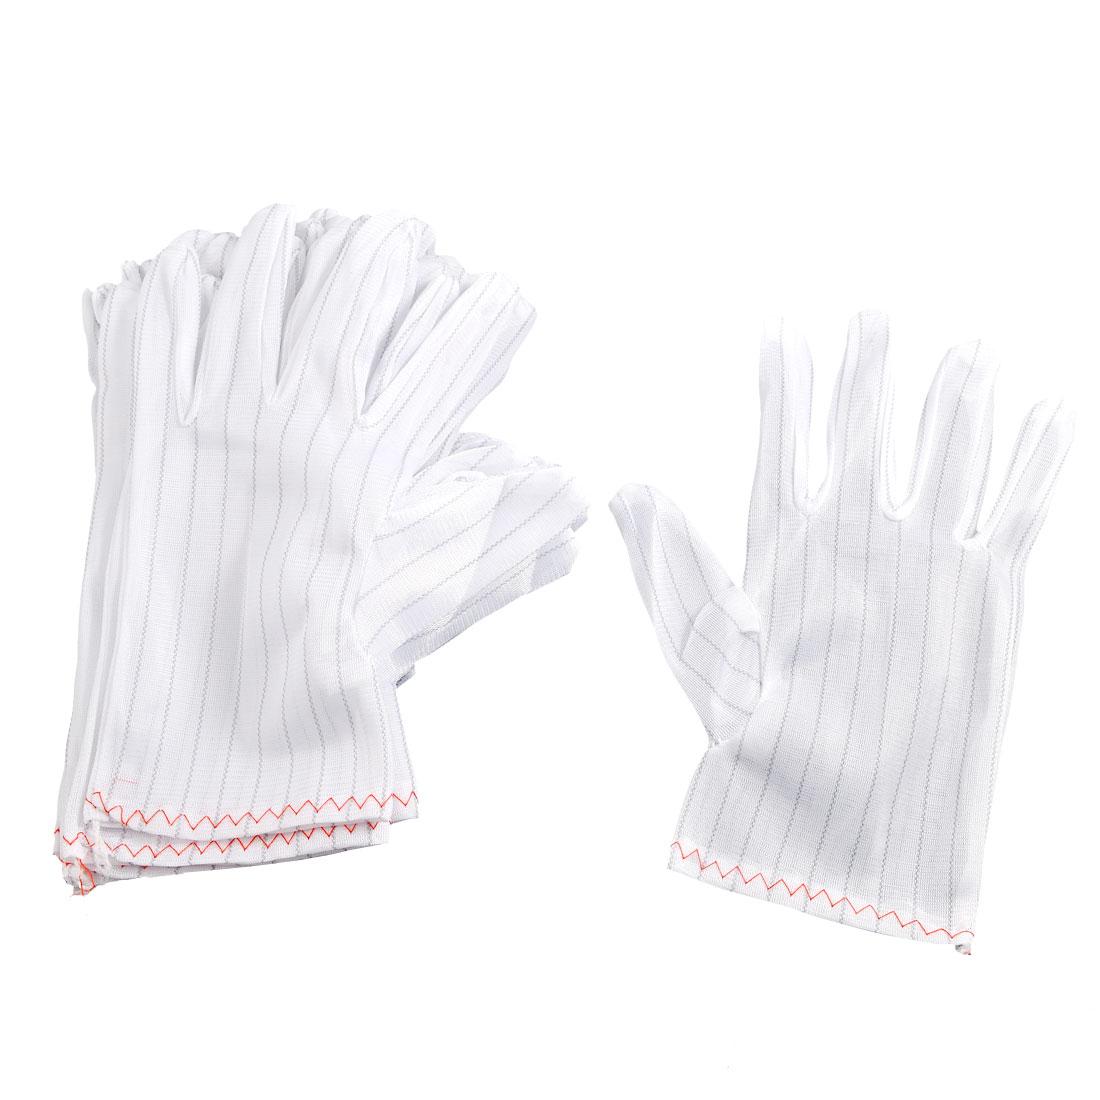 10 Pairs Elastic Anti-static Full Finger Working Gloves White